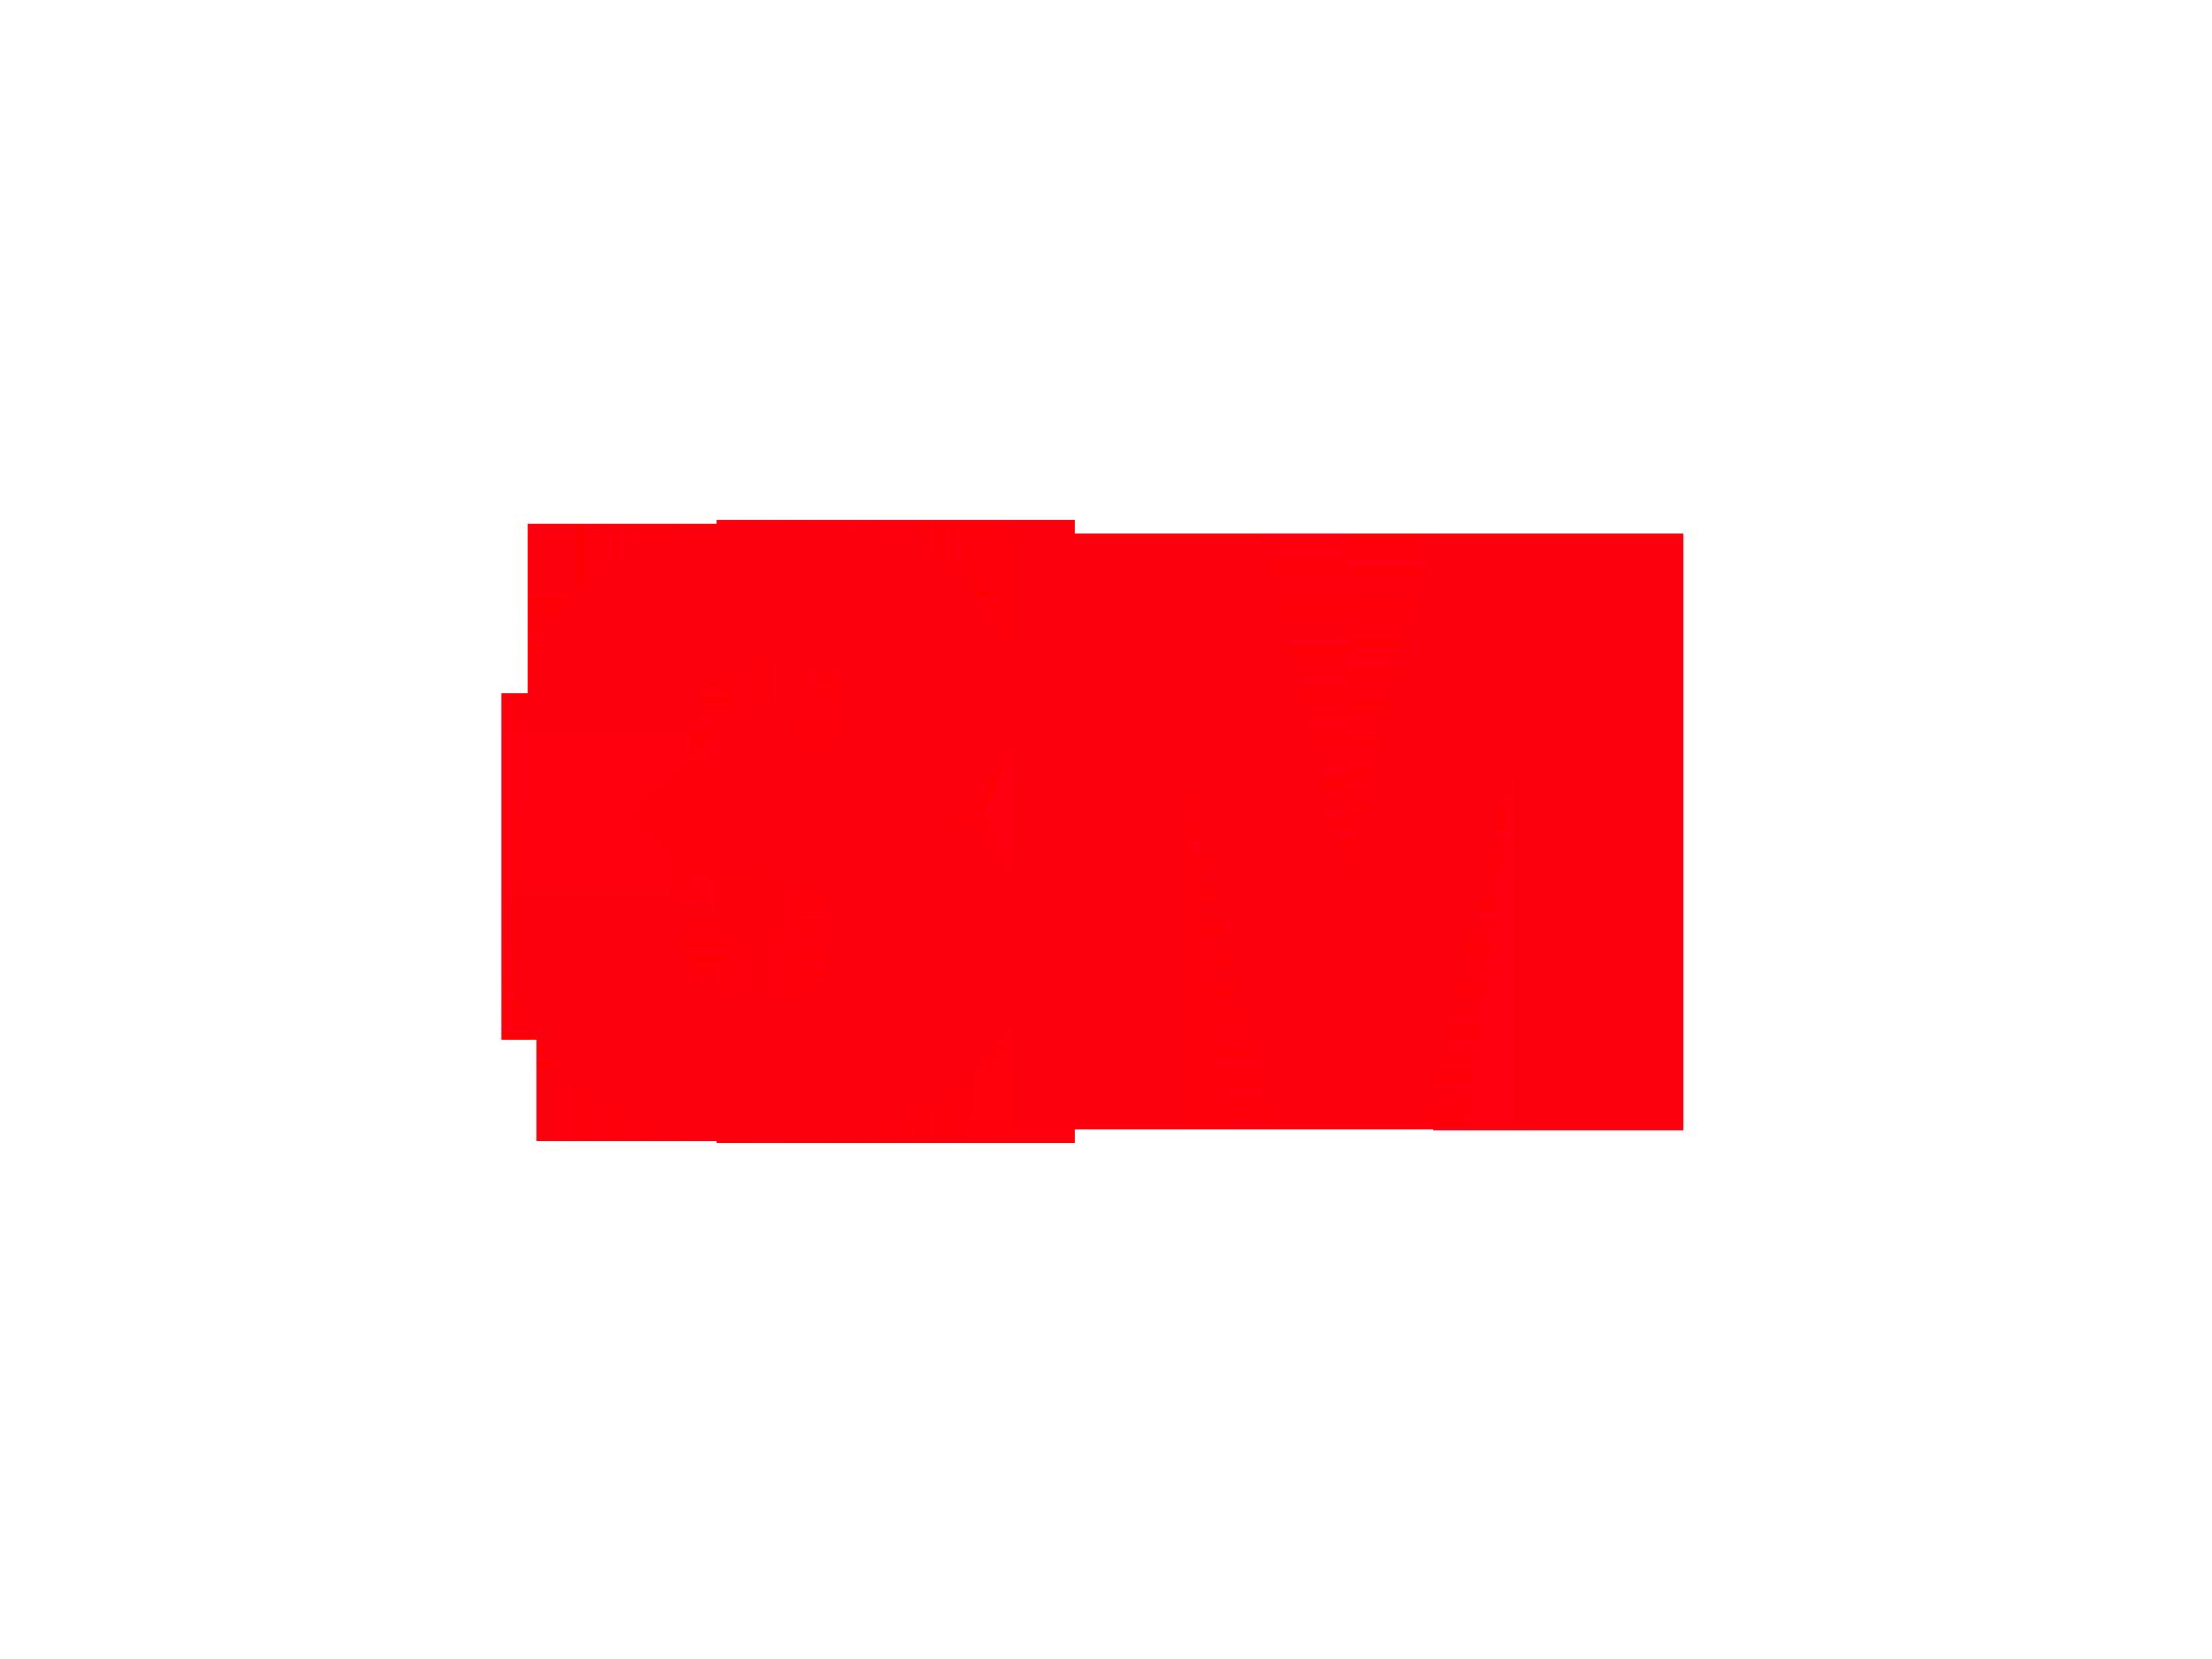 3M Image